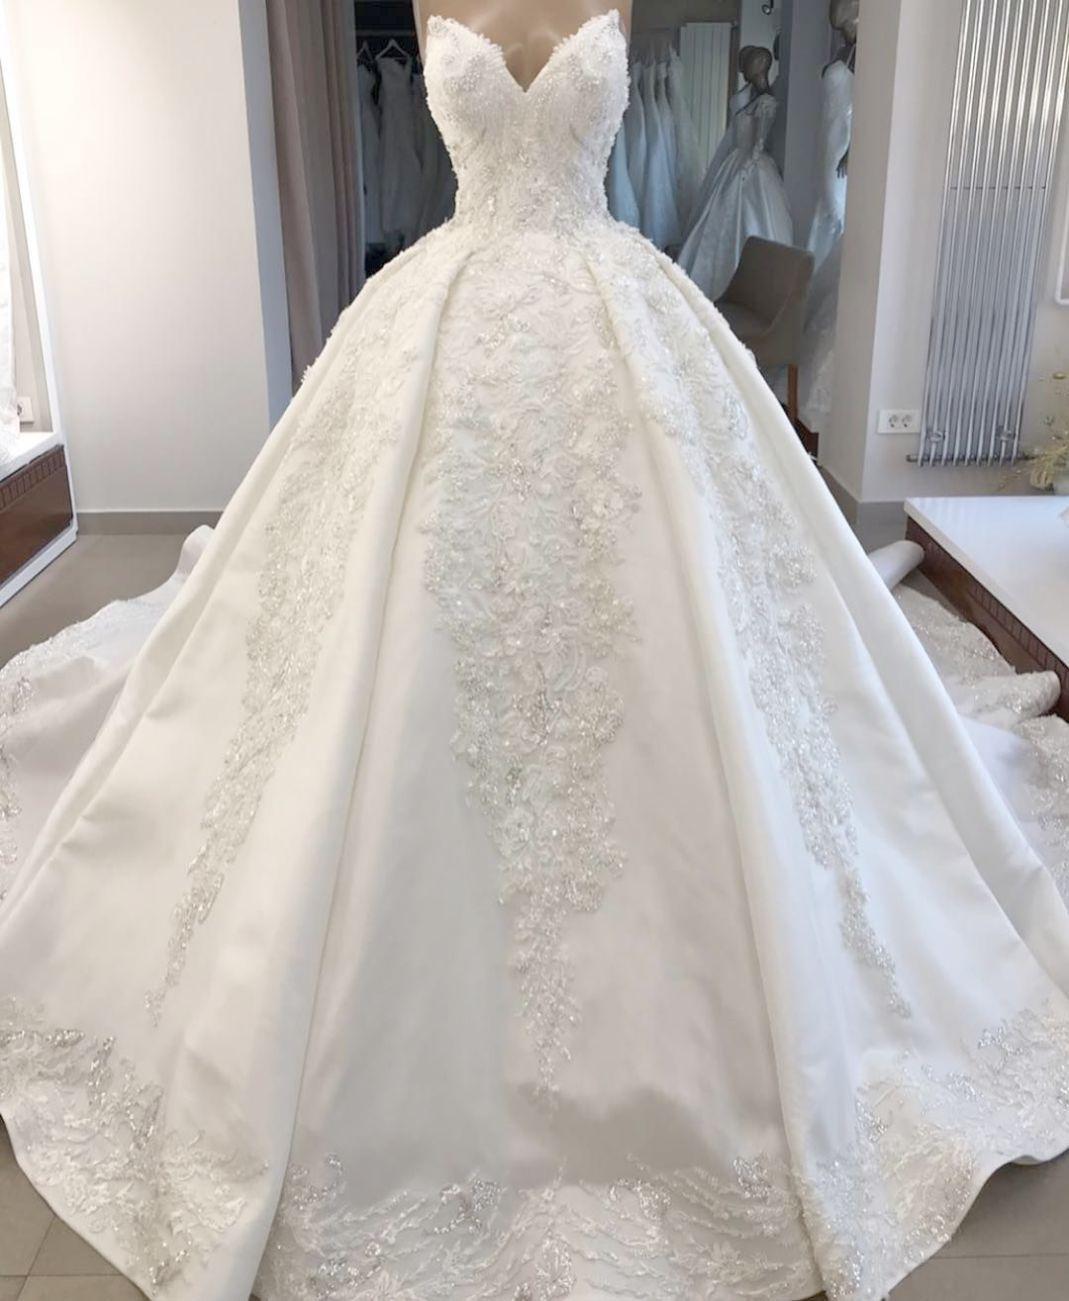 Wedding Officiant Nj Time Wedding Dresses Houston Texas From Wedding Dress Long Sleeve Online Whi Bridal Dresses Ball Gown Wedding Dress Applique Wedding Dress